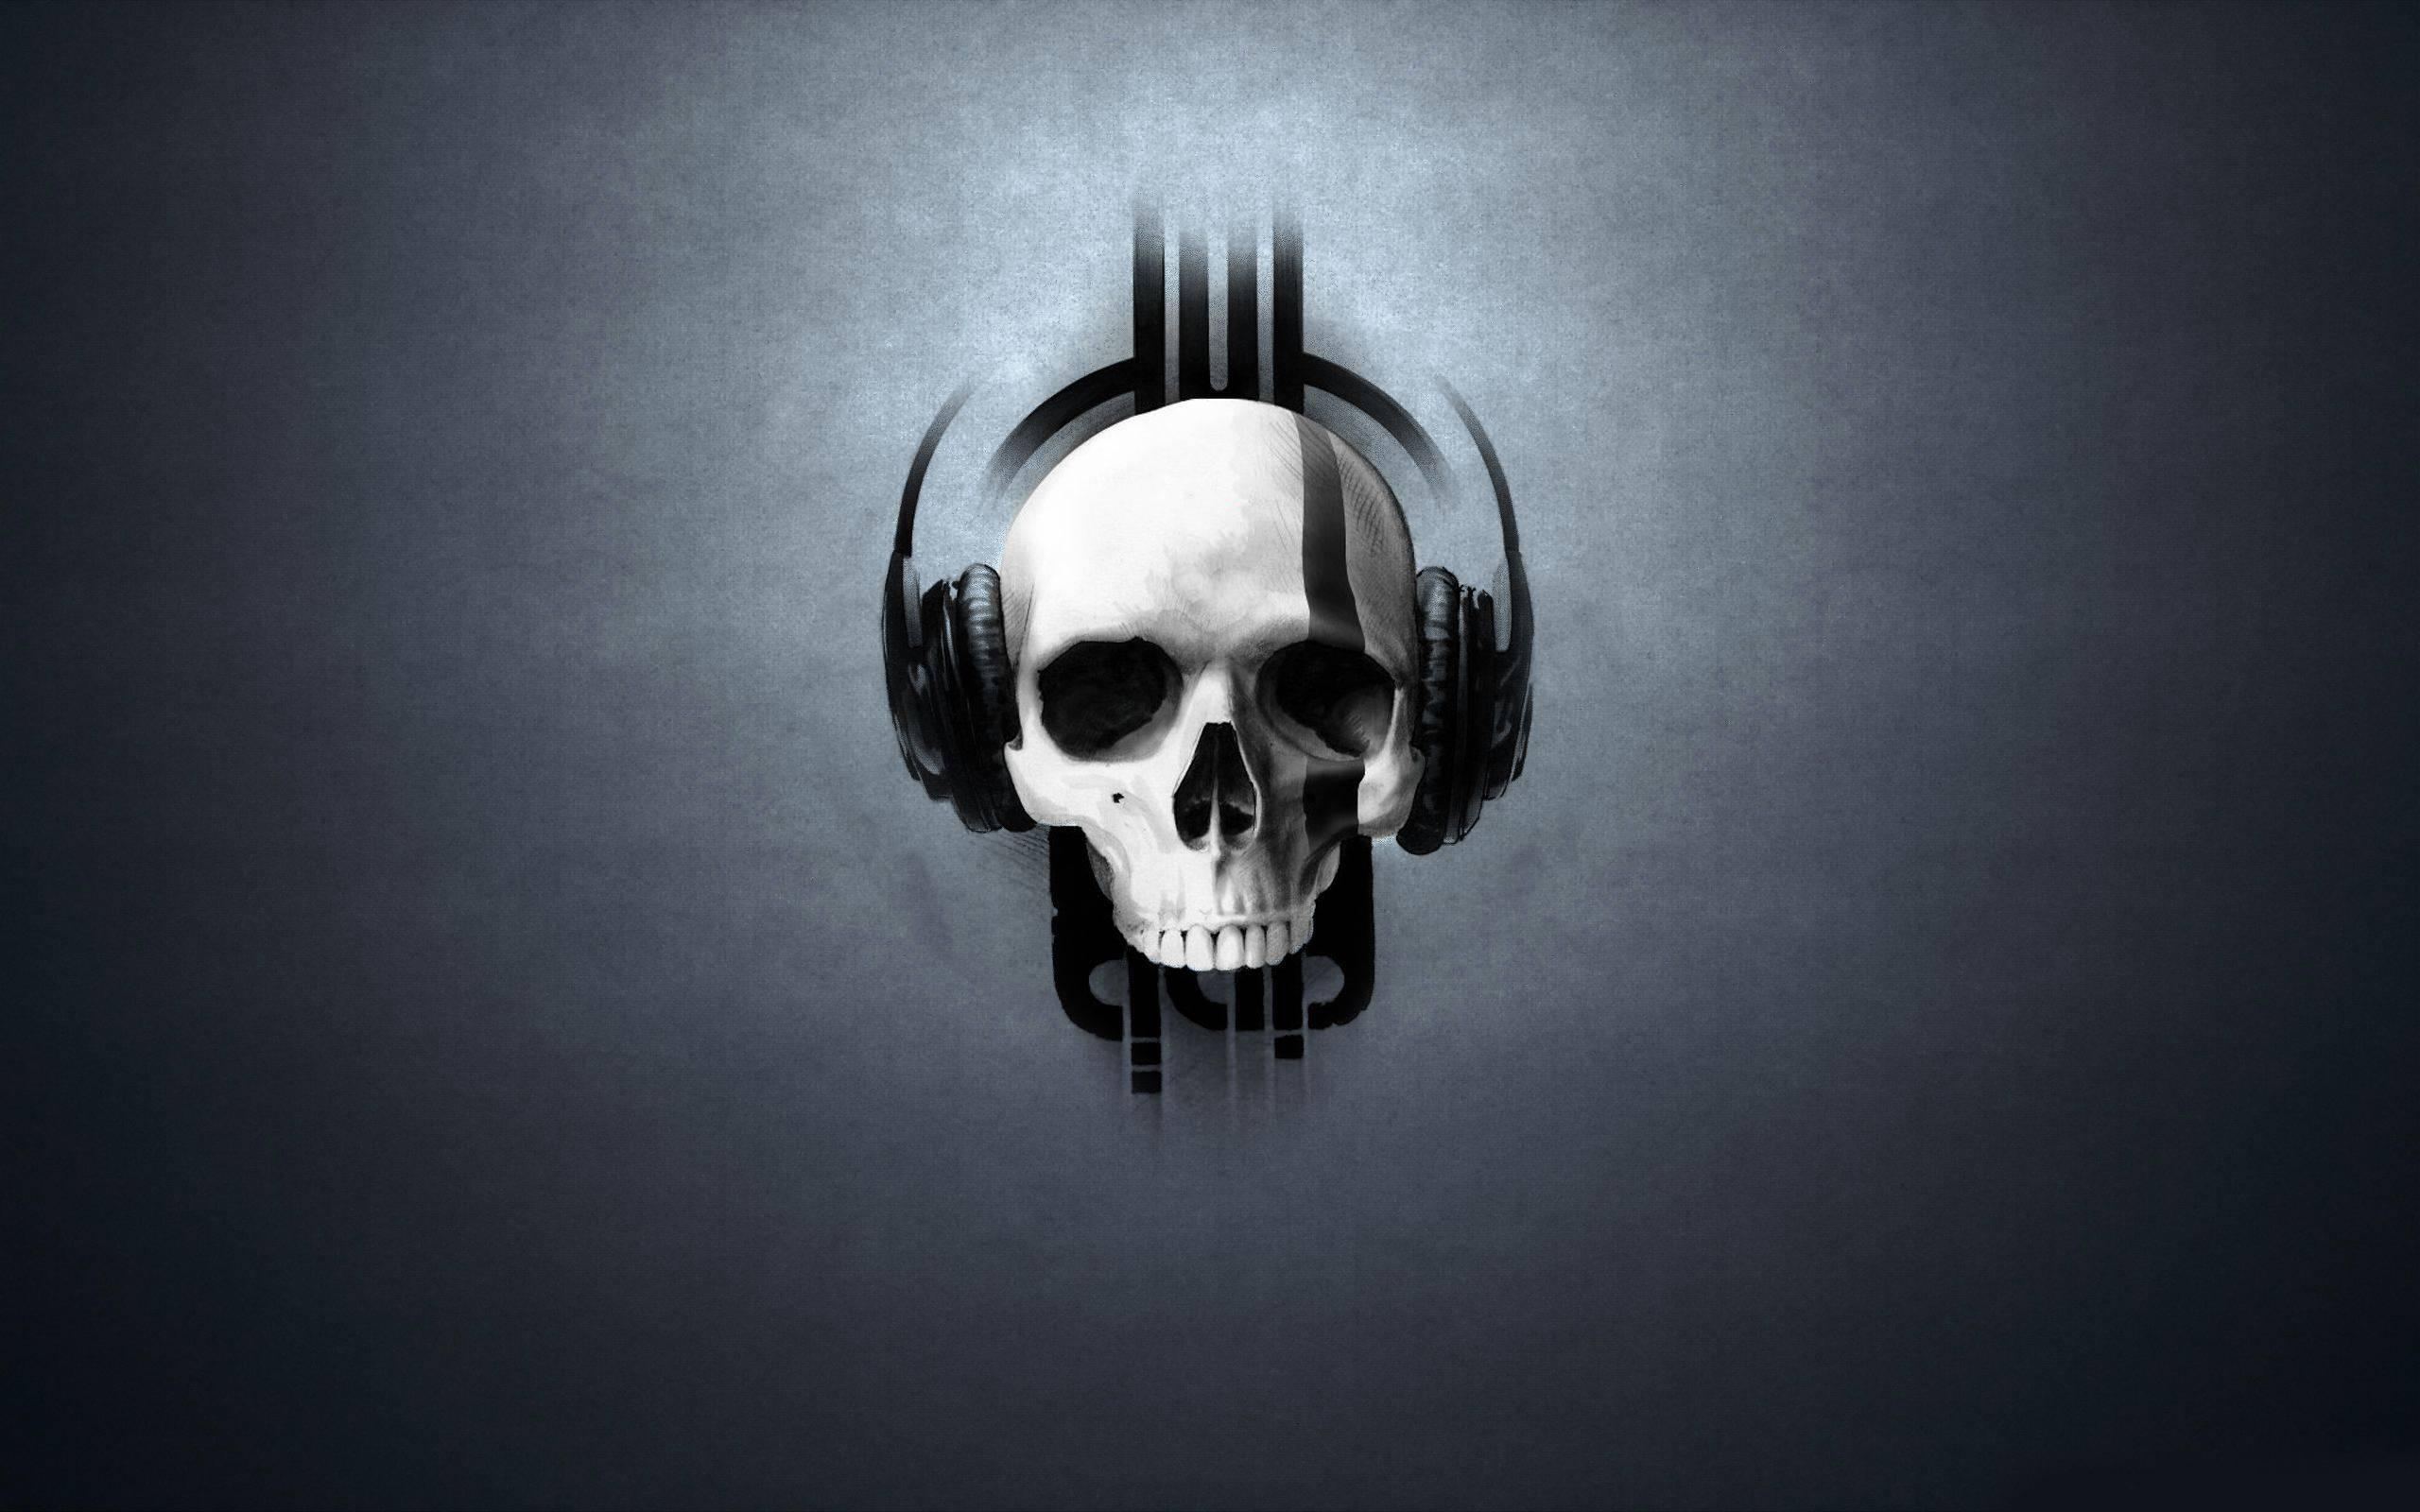 3D Skull Wallpapers 2560x1600